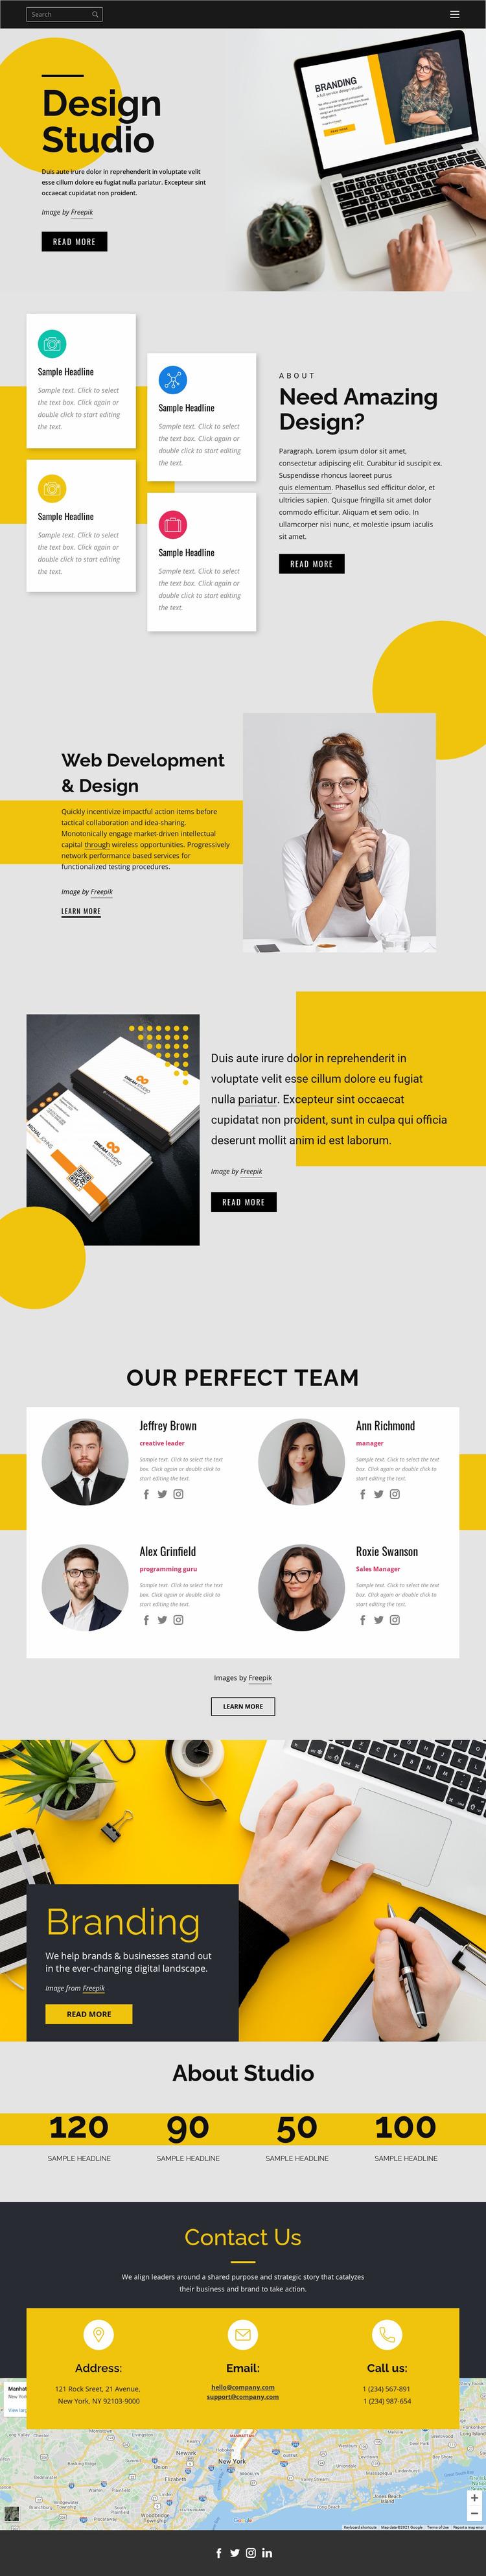 Brand, print & web design Website Mockup